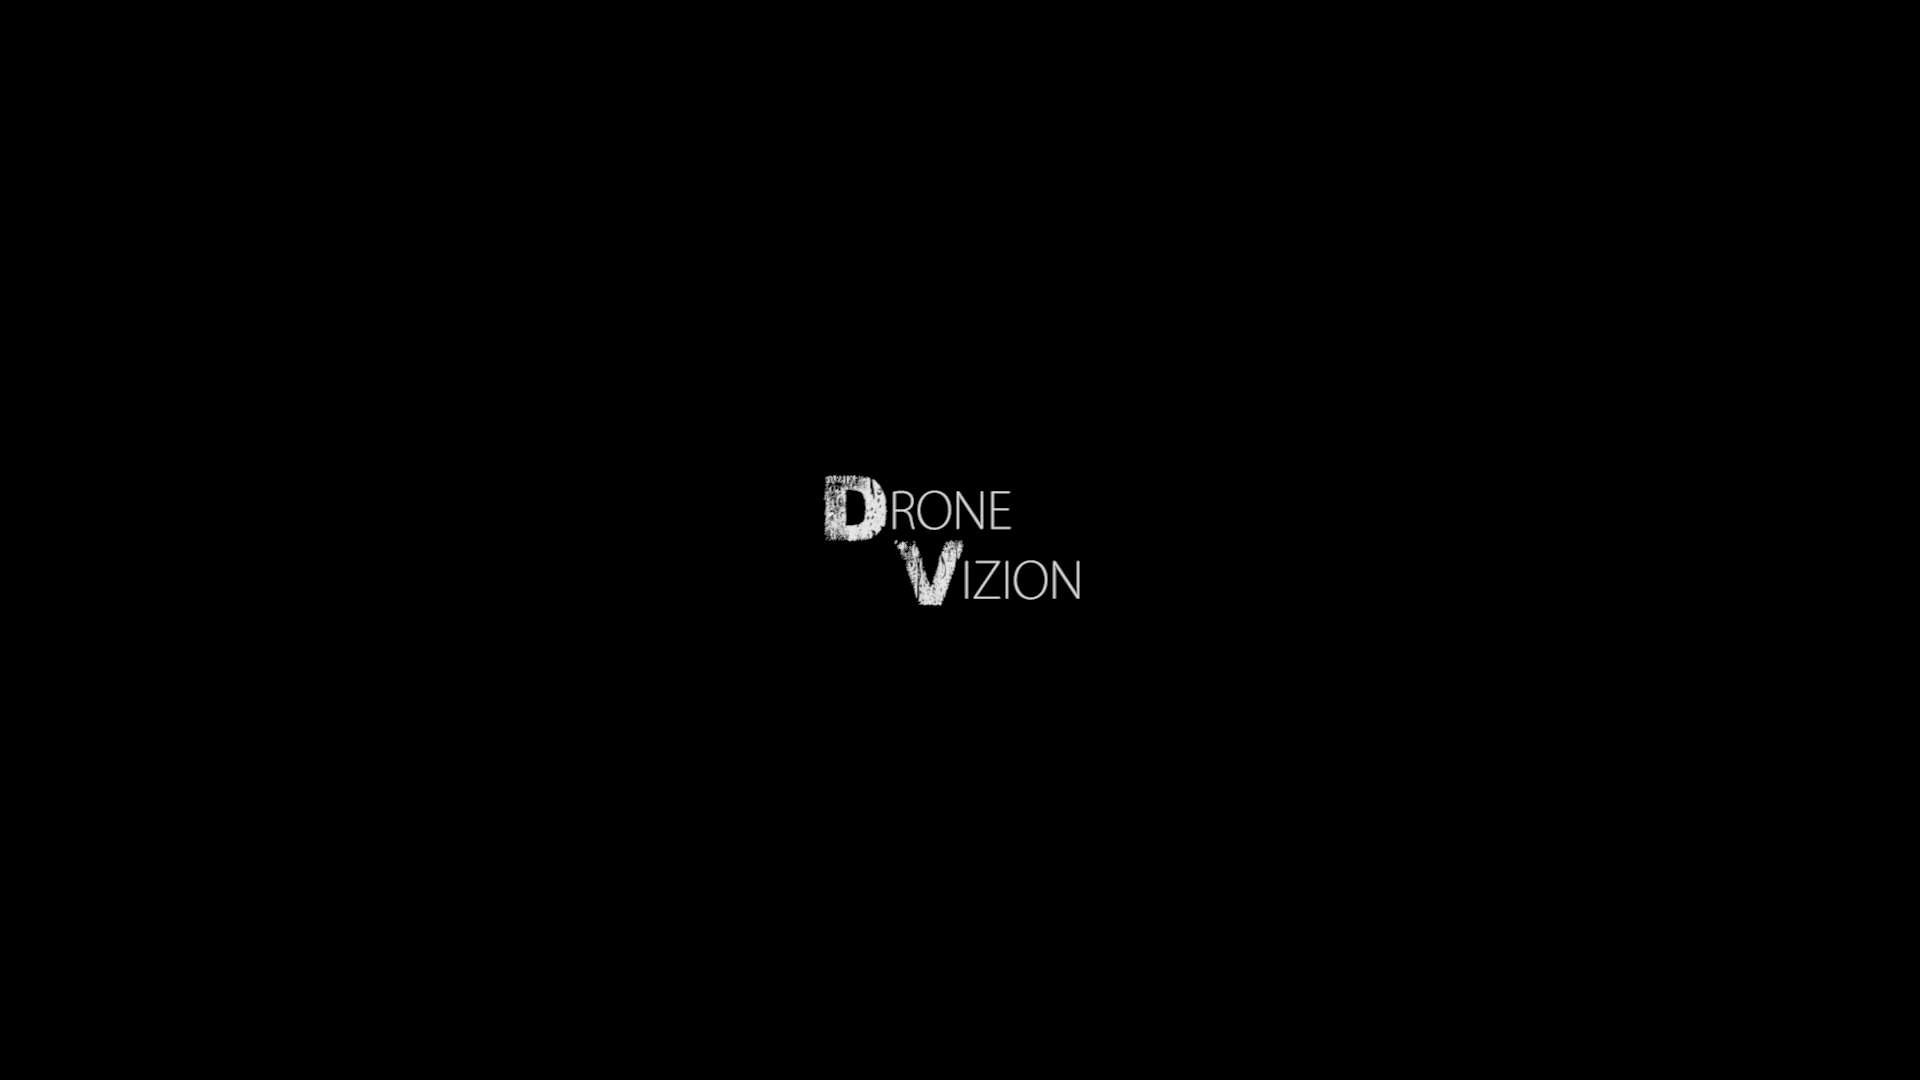 logo drone vizion